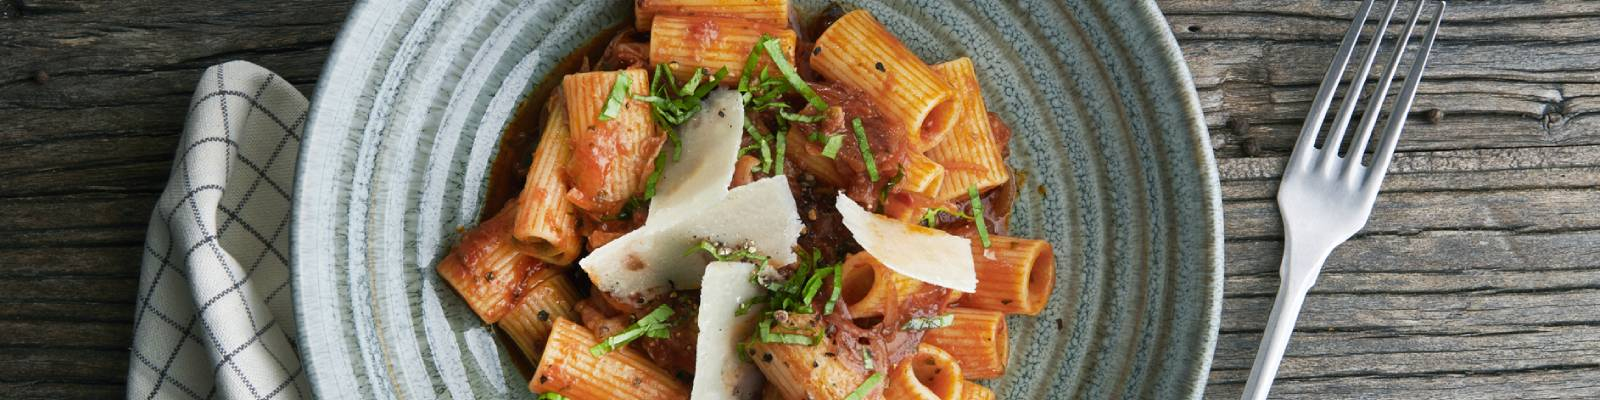 Pasta Garofalo - Rigatoni amatriciana